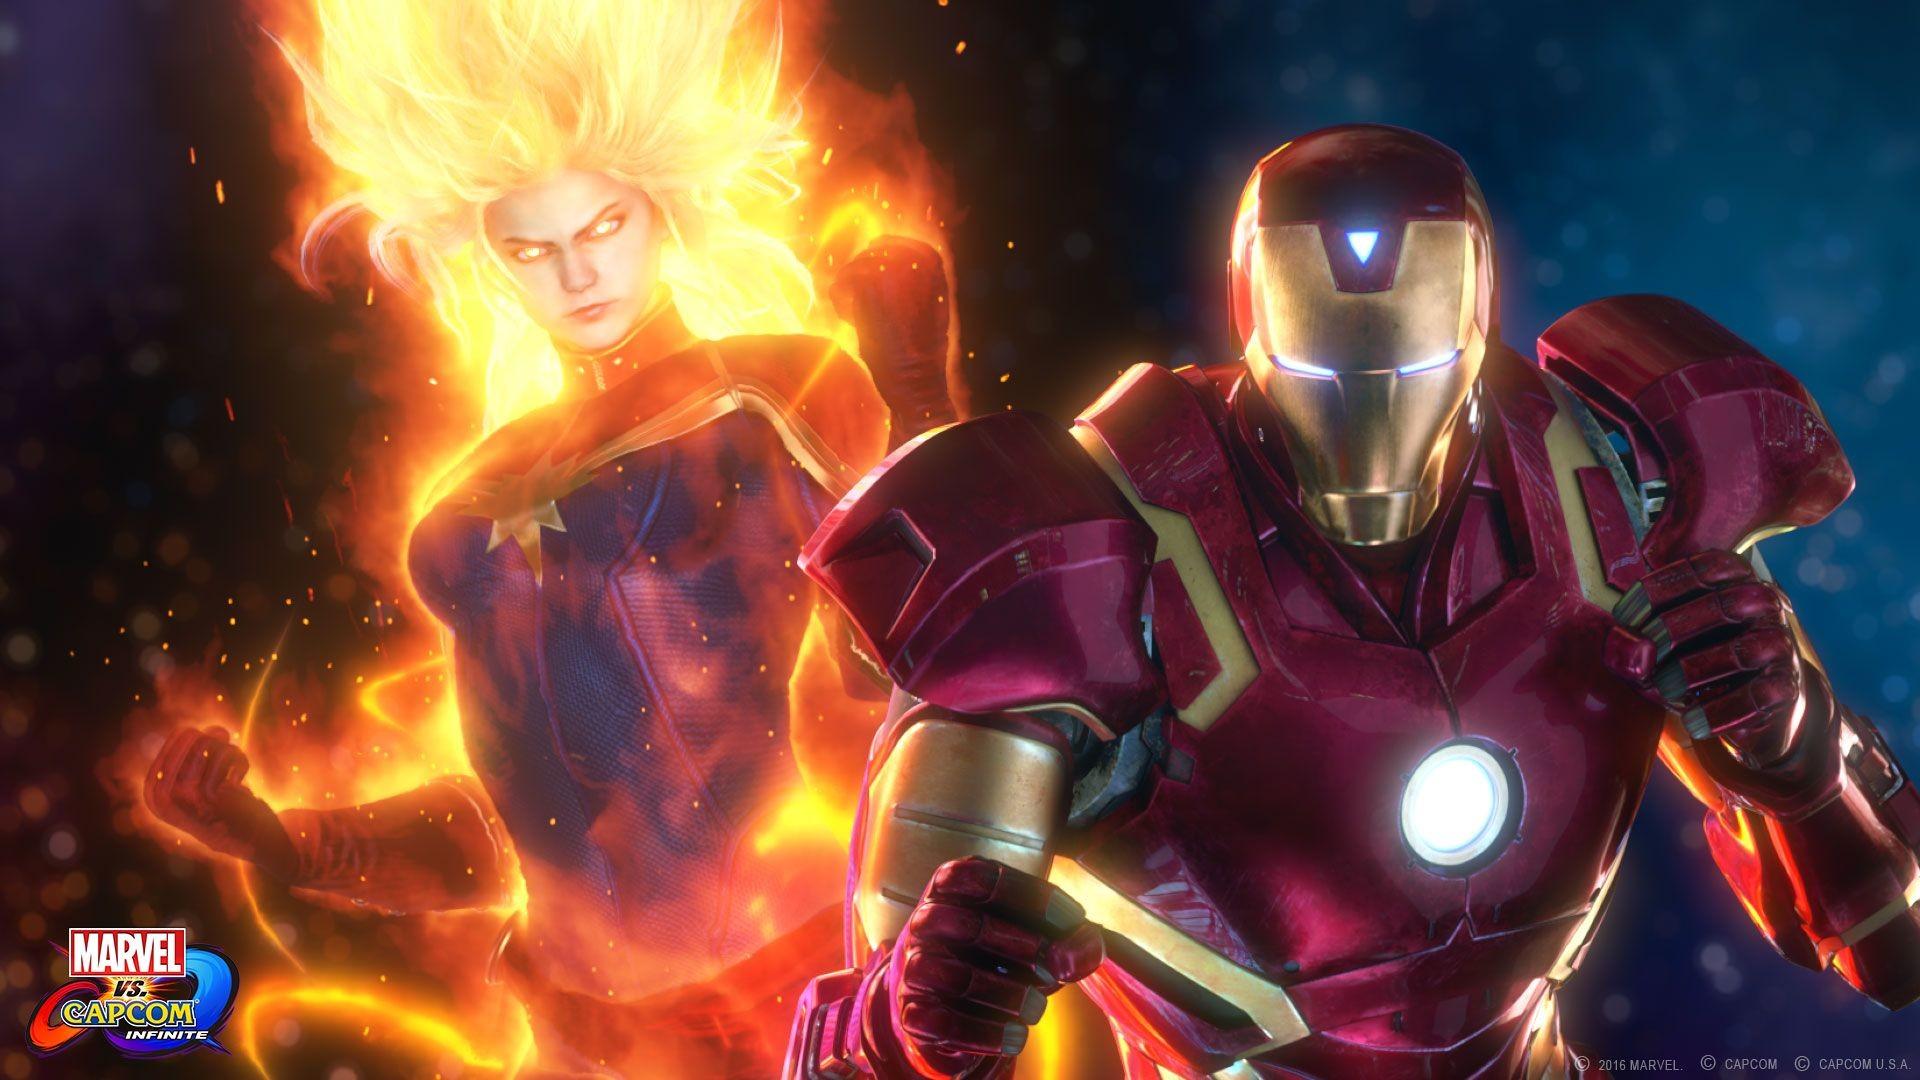 Res: 1920x1080, Nice Captain Marvel and Iron Man Marvel vs. Capcom: Infinite wallpaper